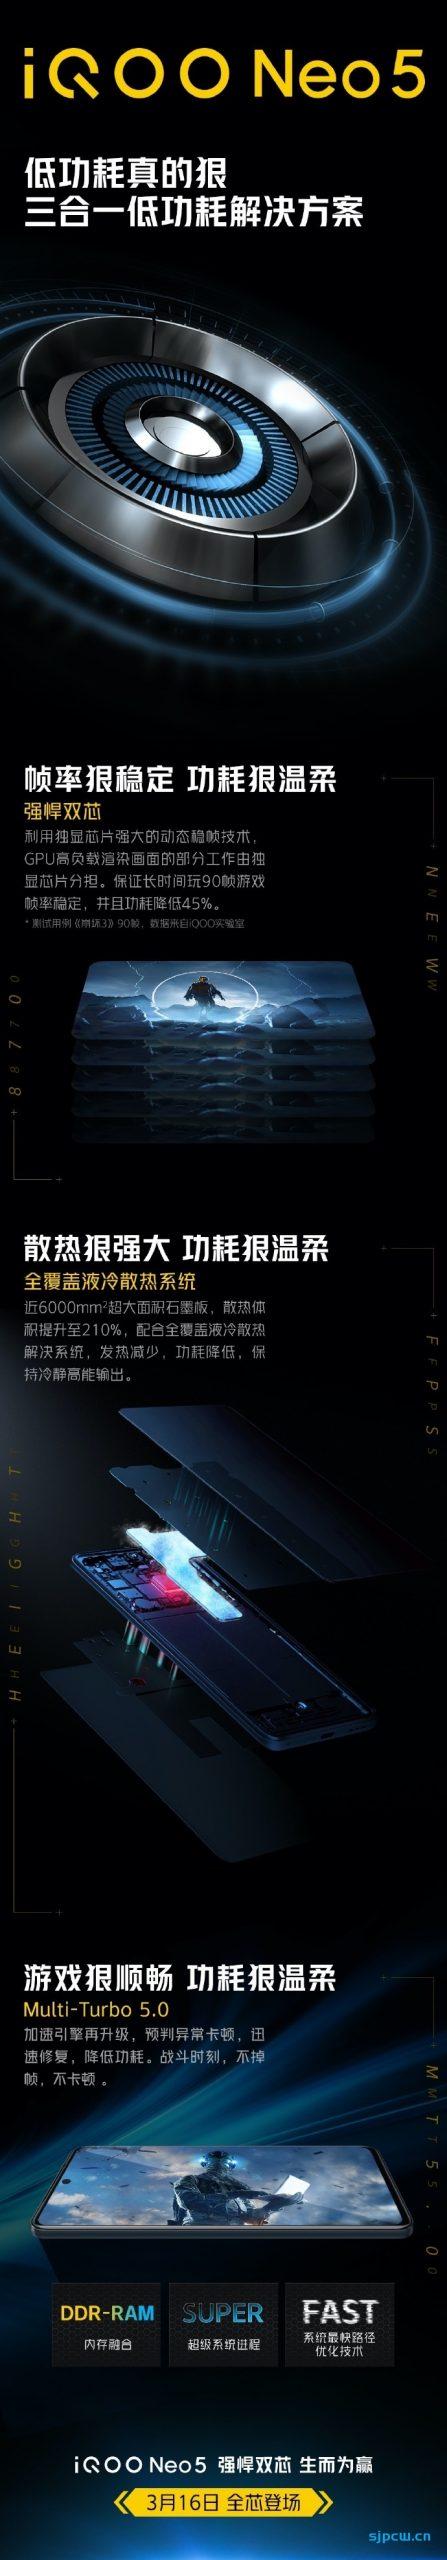 iQOO Neo5官宣将搭载独显芯片:分担GPU压力,功耗降低45%